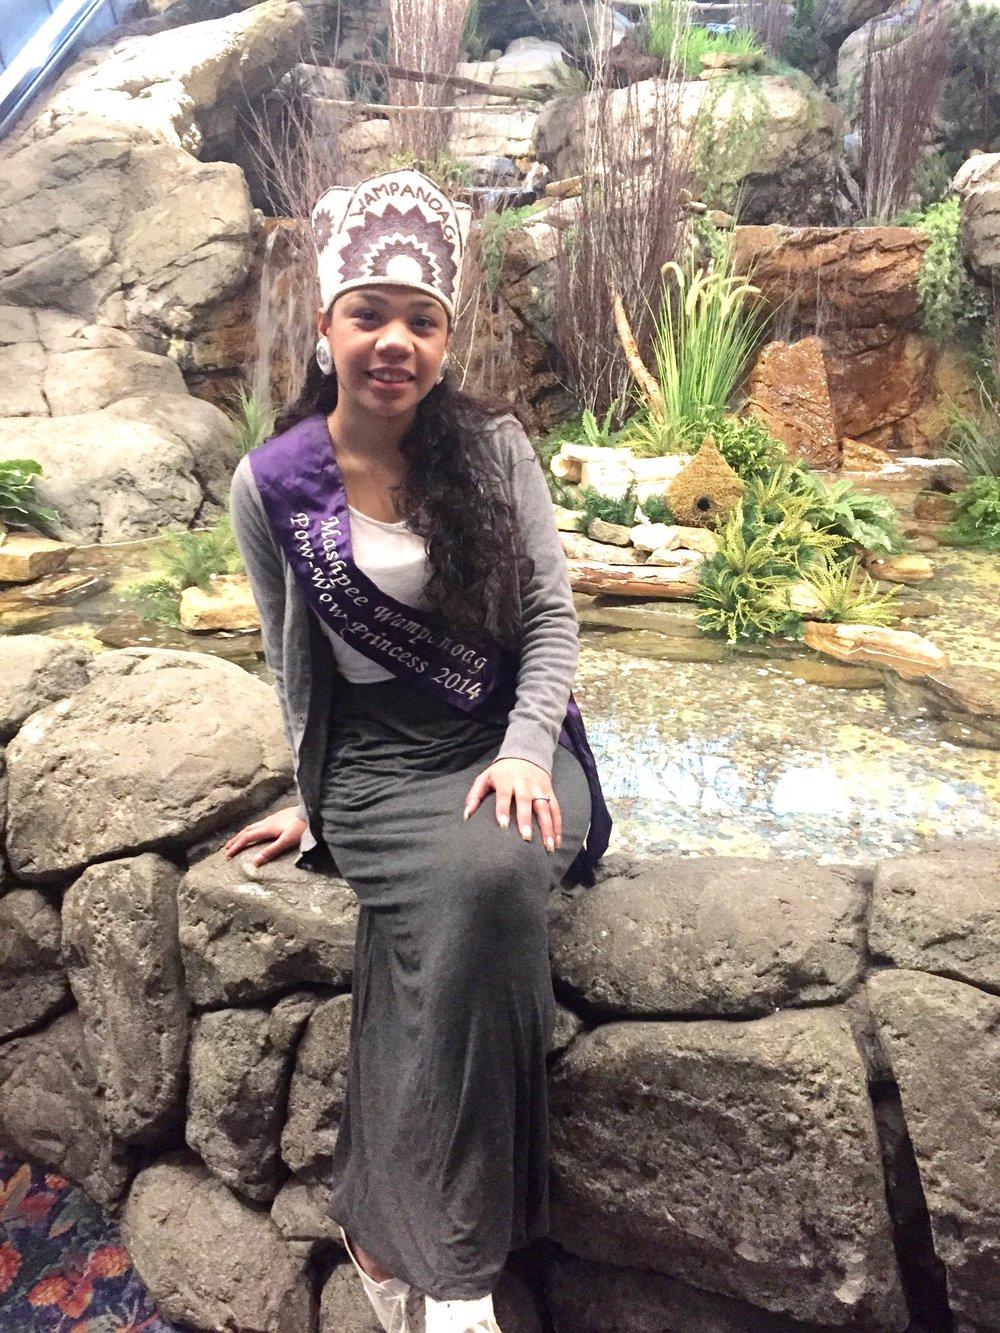 Sassamin Renee Weeden , Mashpee Wampanoag Powwow Princess 2014-2015